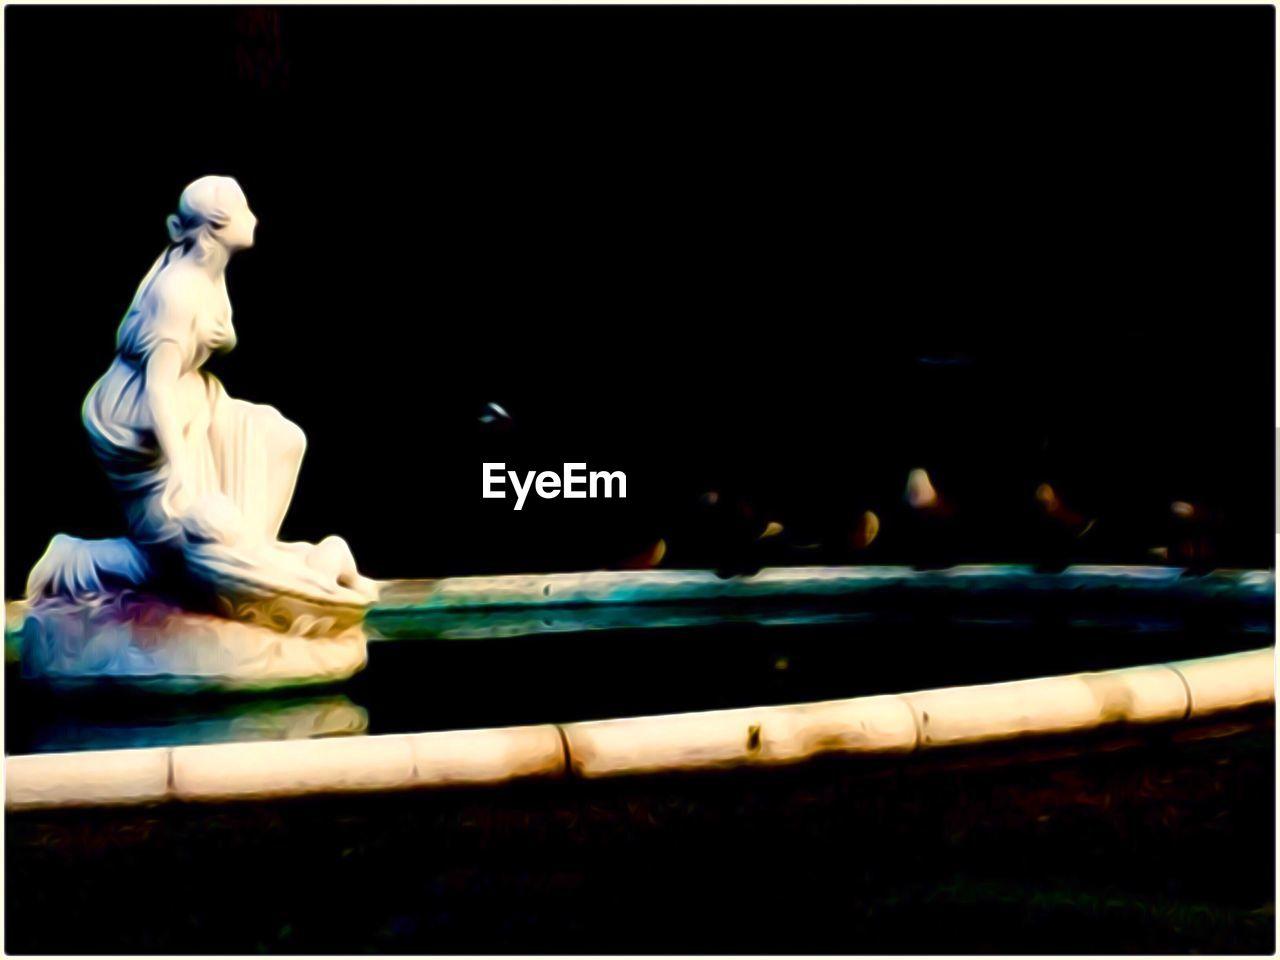 statue, sculpture, night, no people, close-up, indoors, illuminated